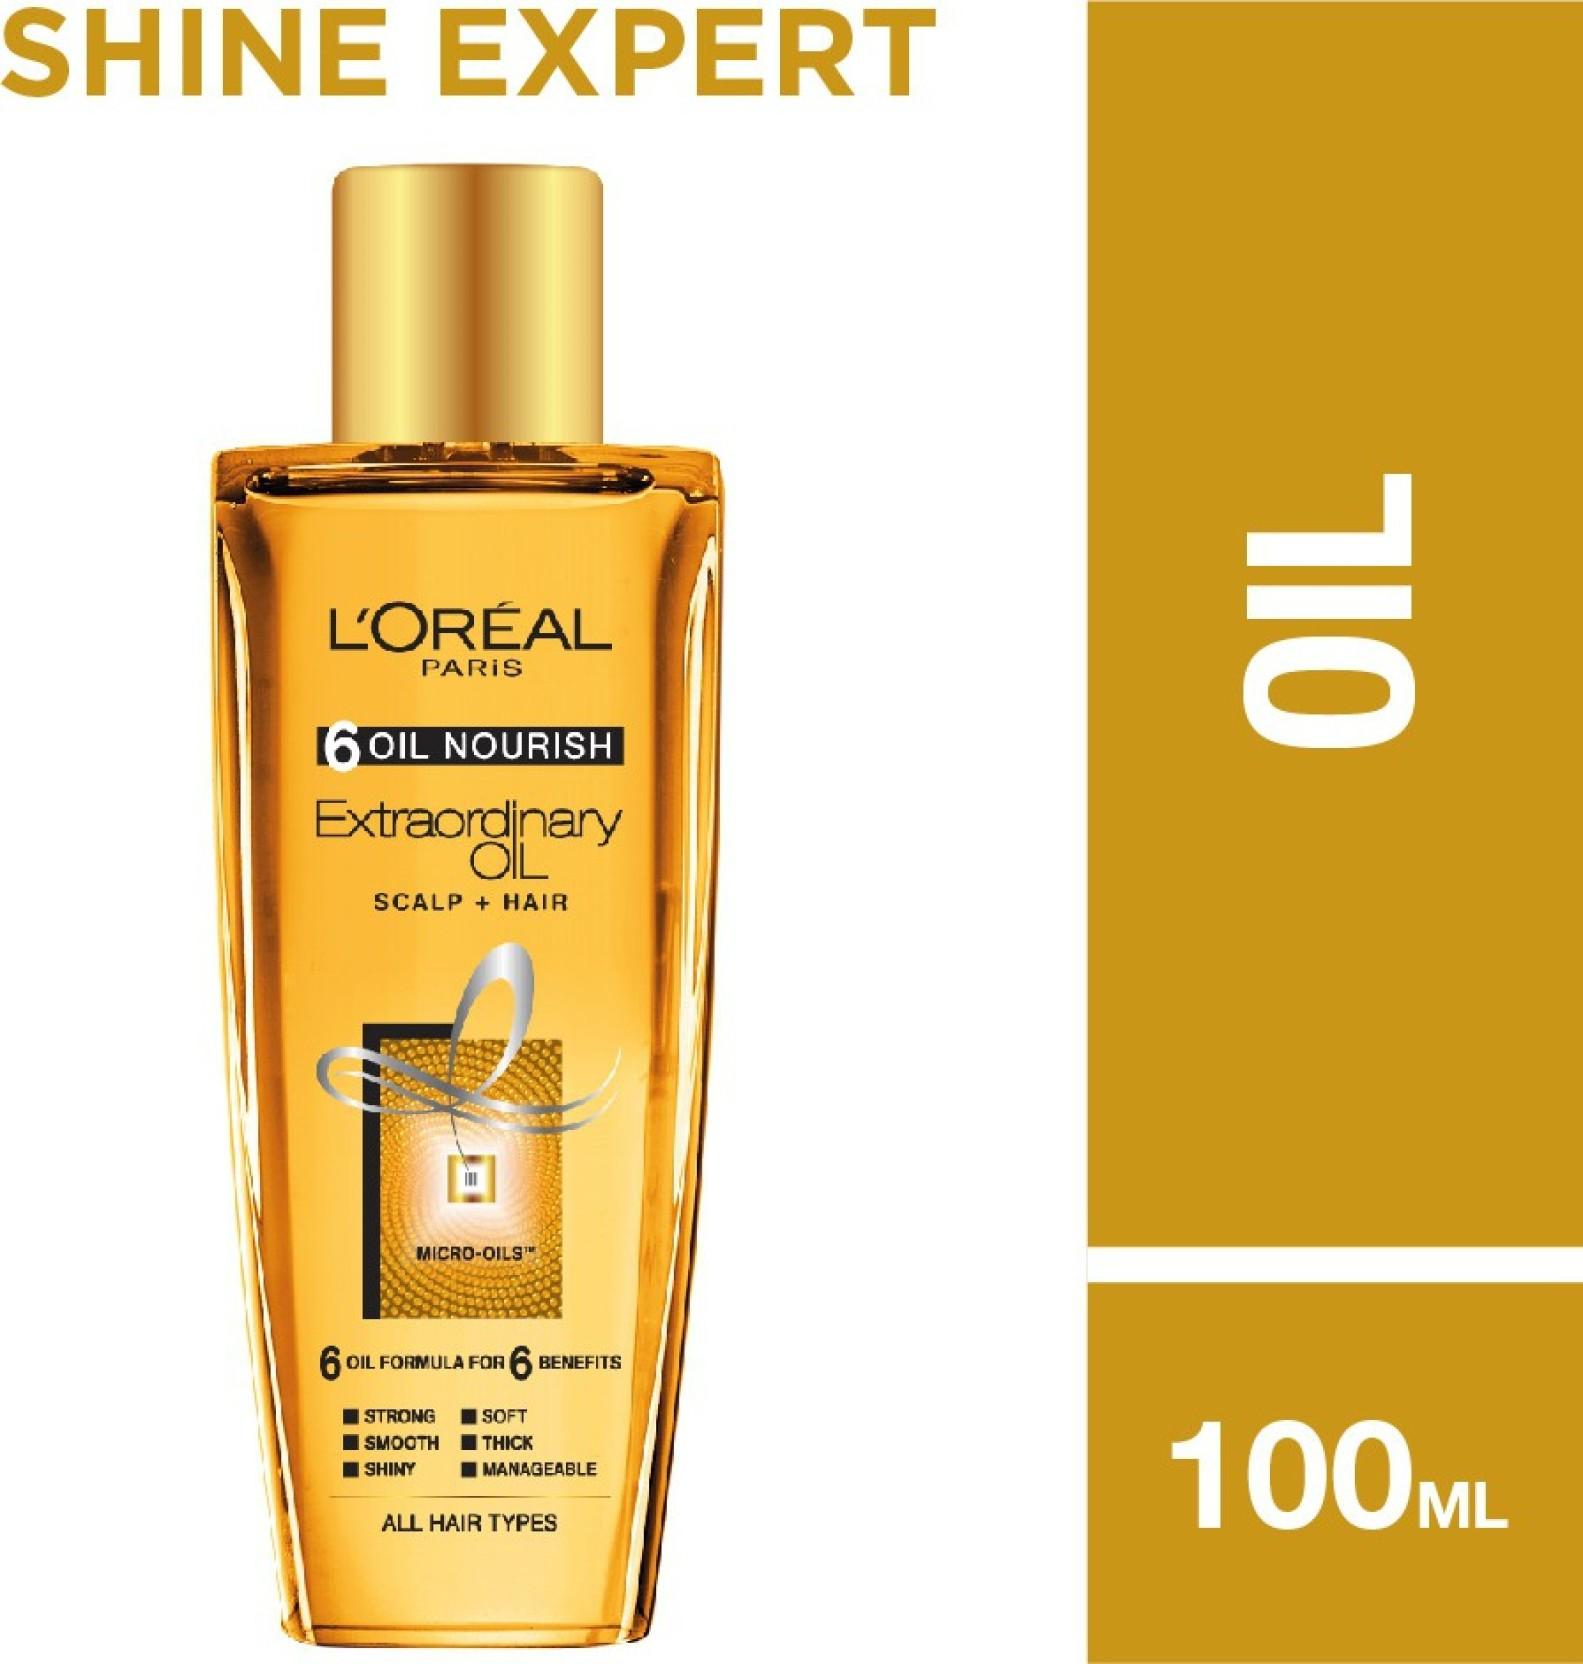 L'Oreal Paris 6 Oil Nourish Extraordinary Hair Oil